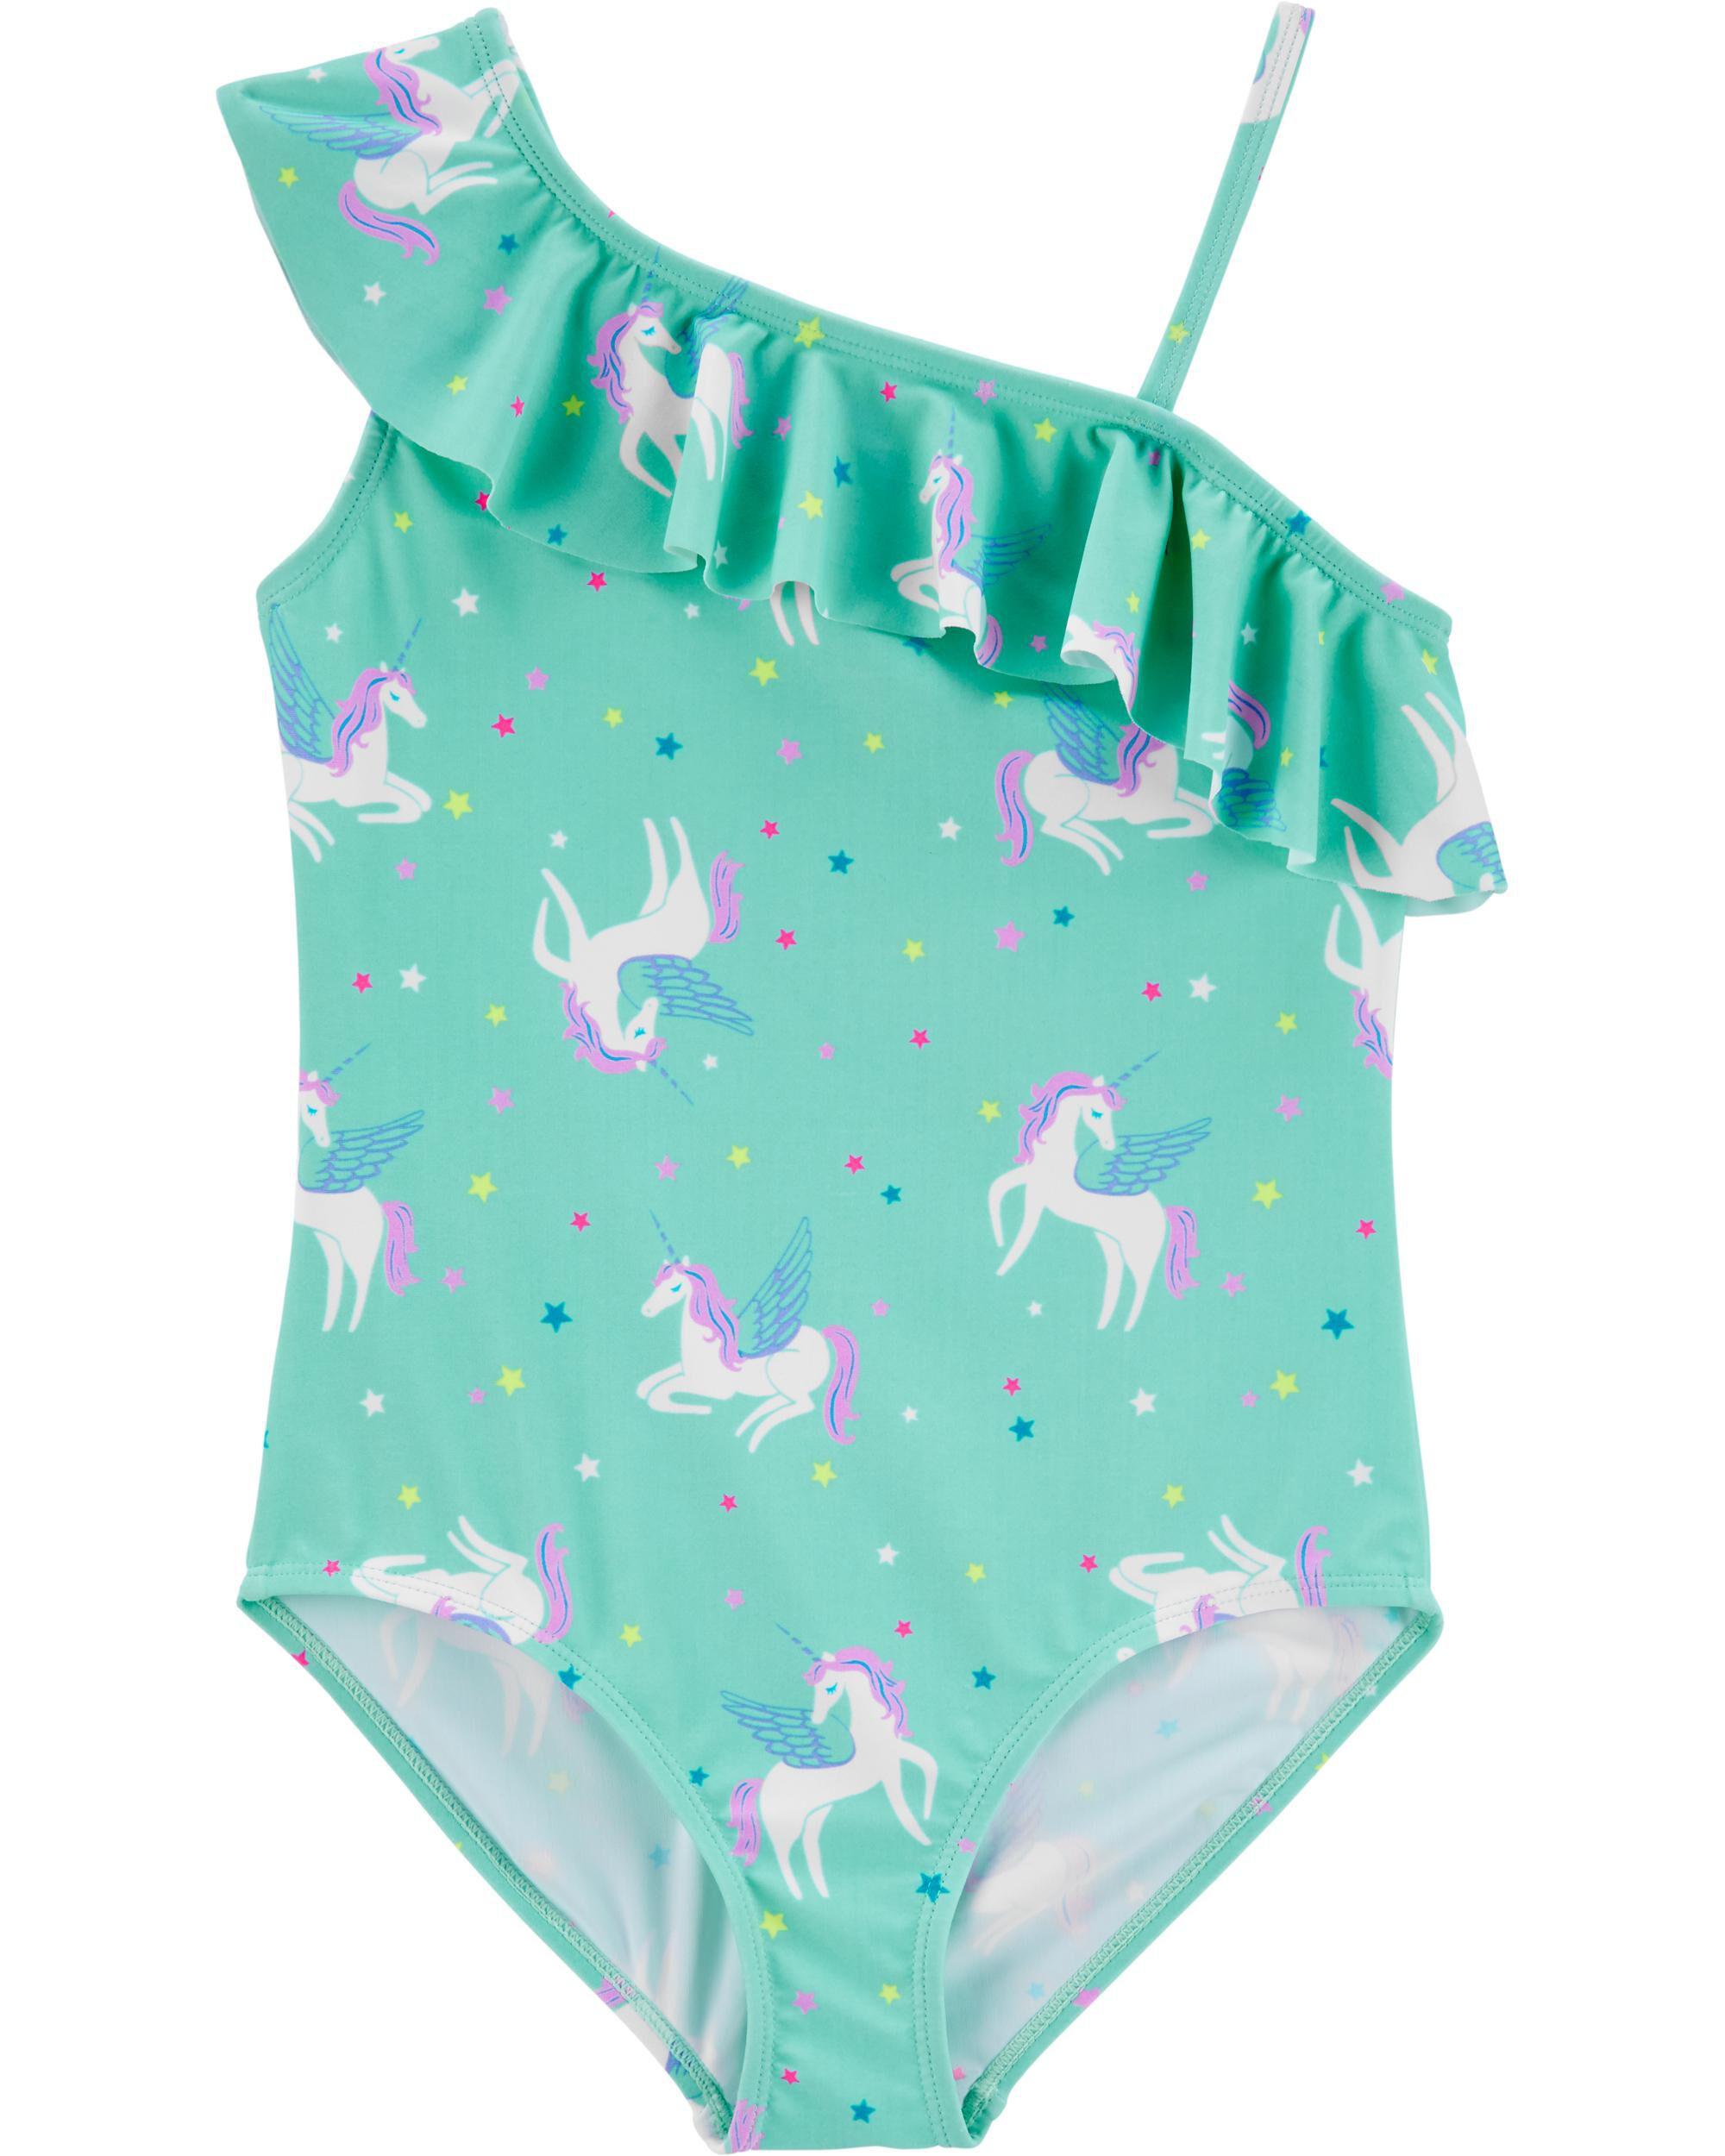 Osh Kosh Baby Girls Multi Print One Piece Swimsuit